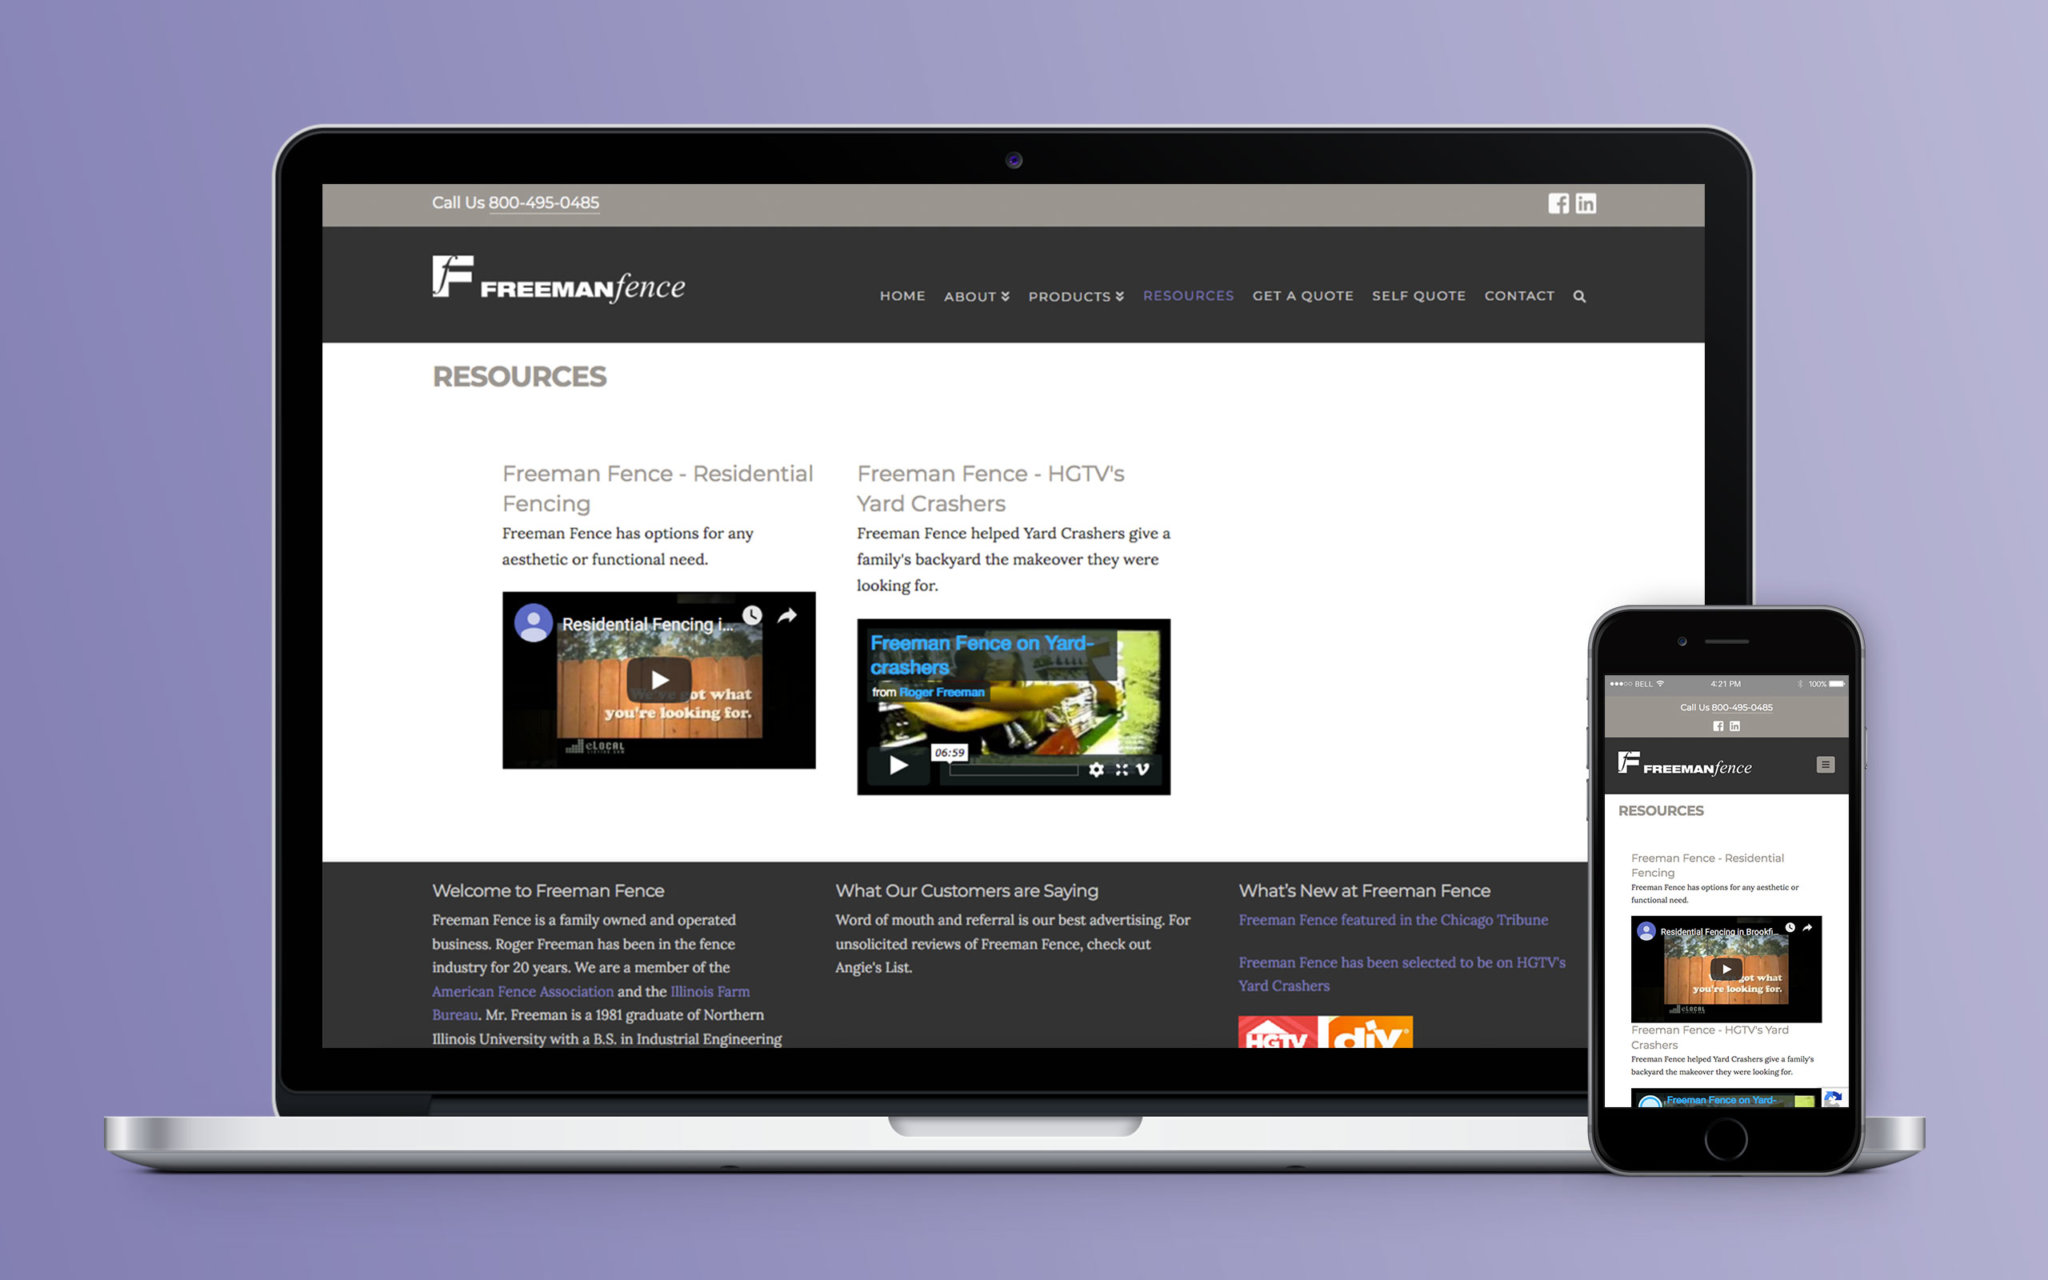 Freeman Fence Website Resources